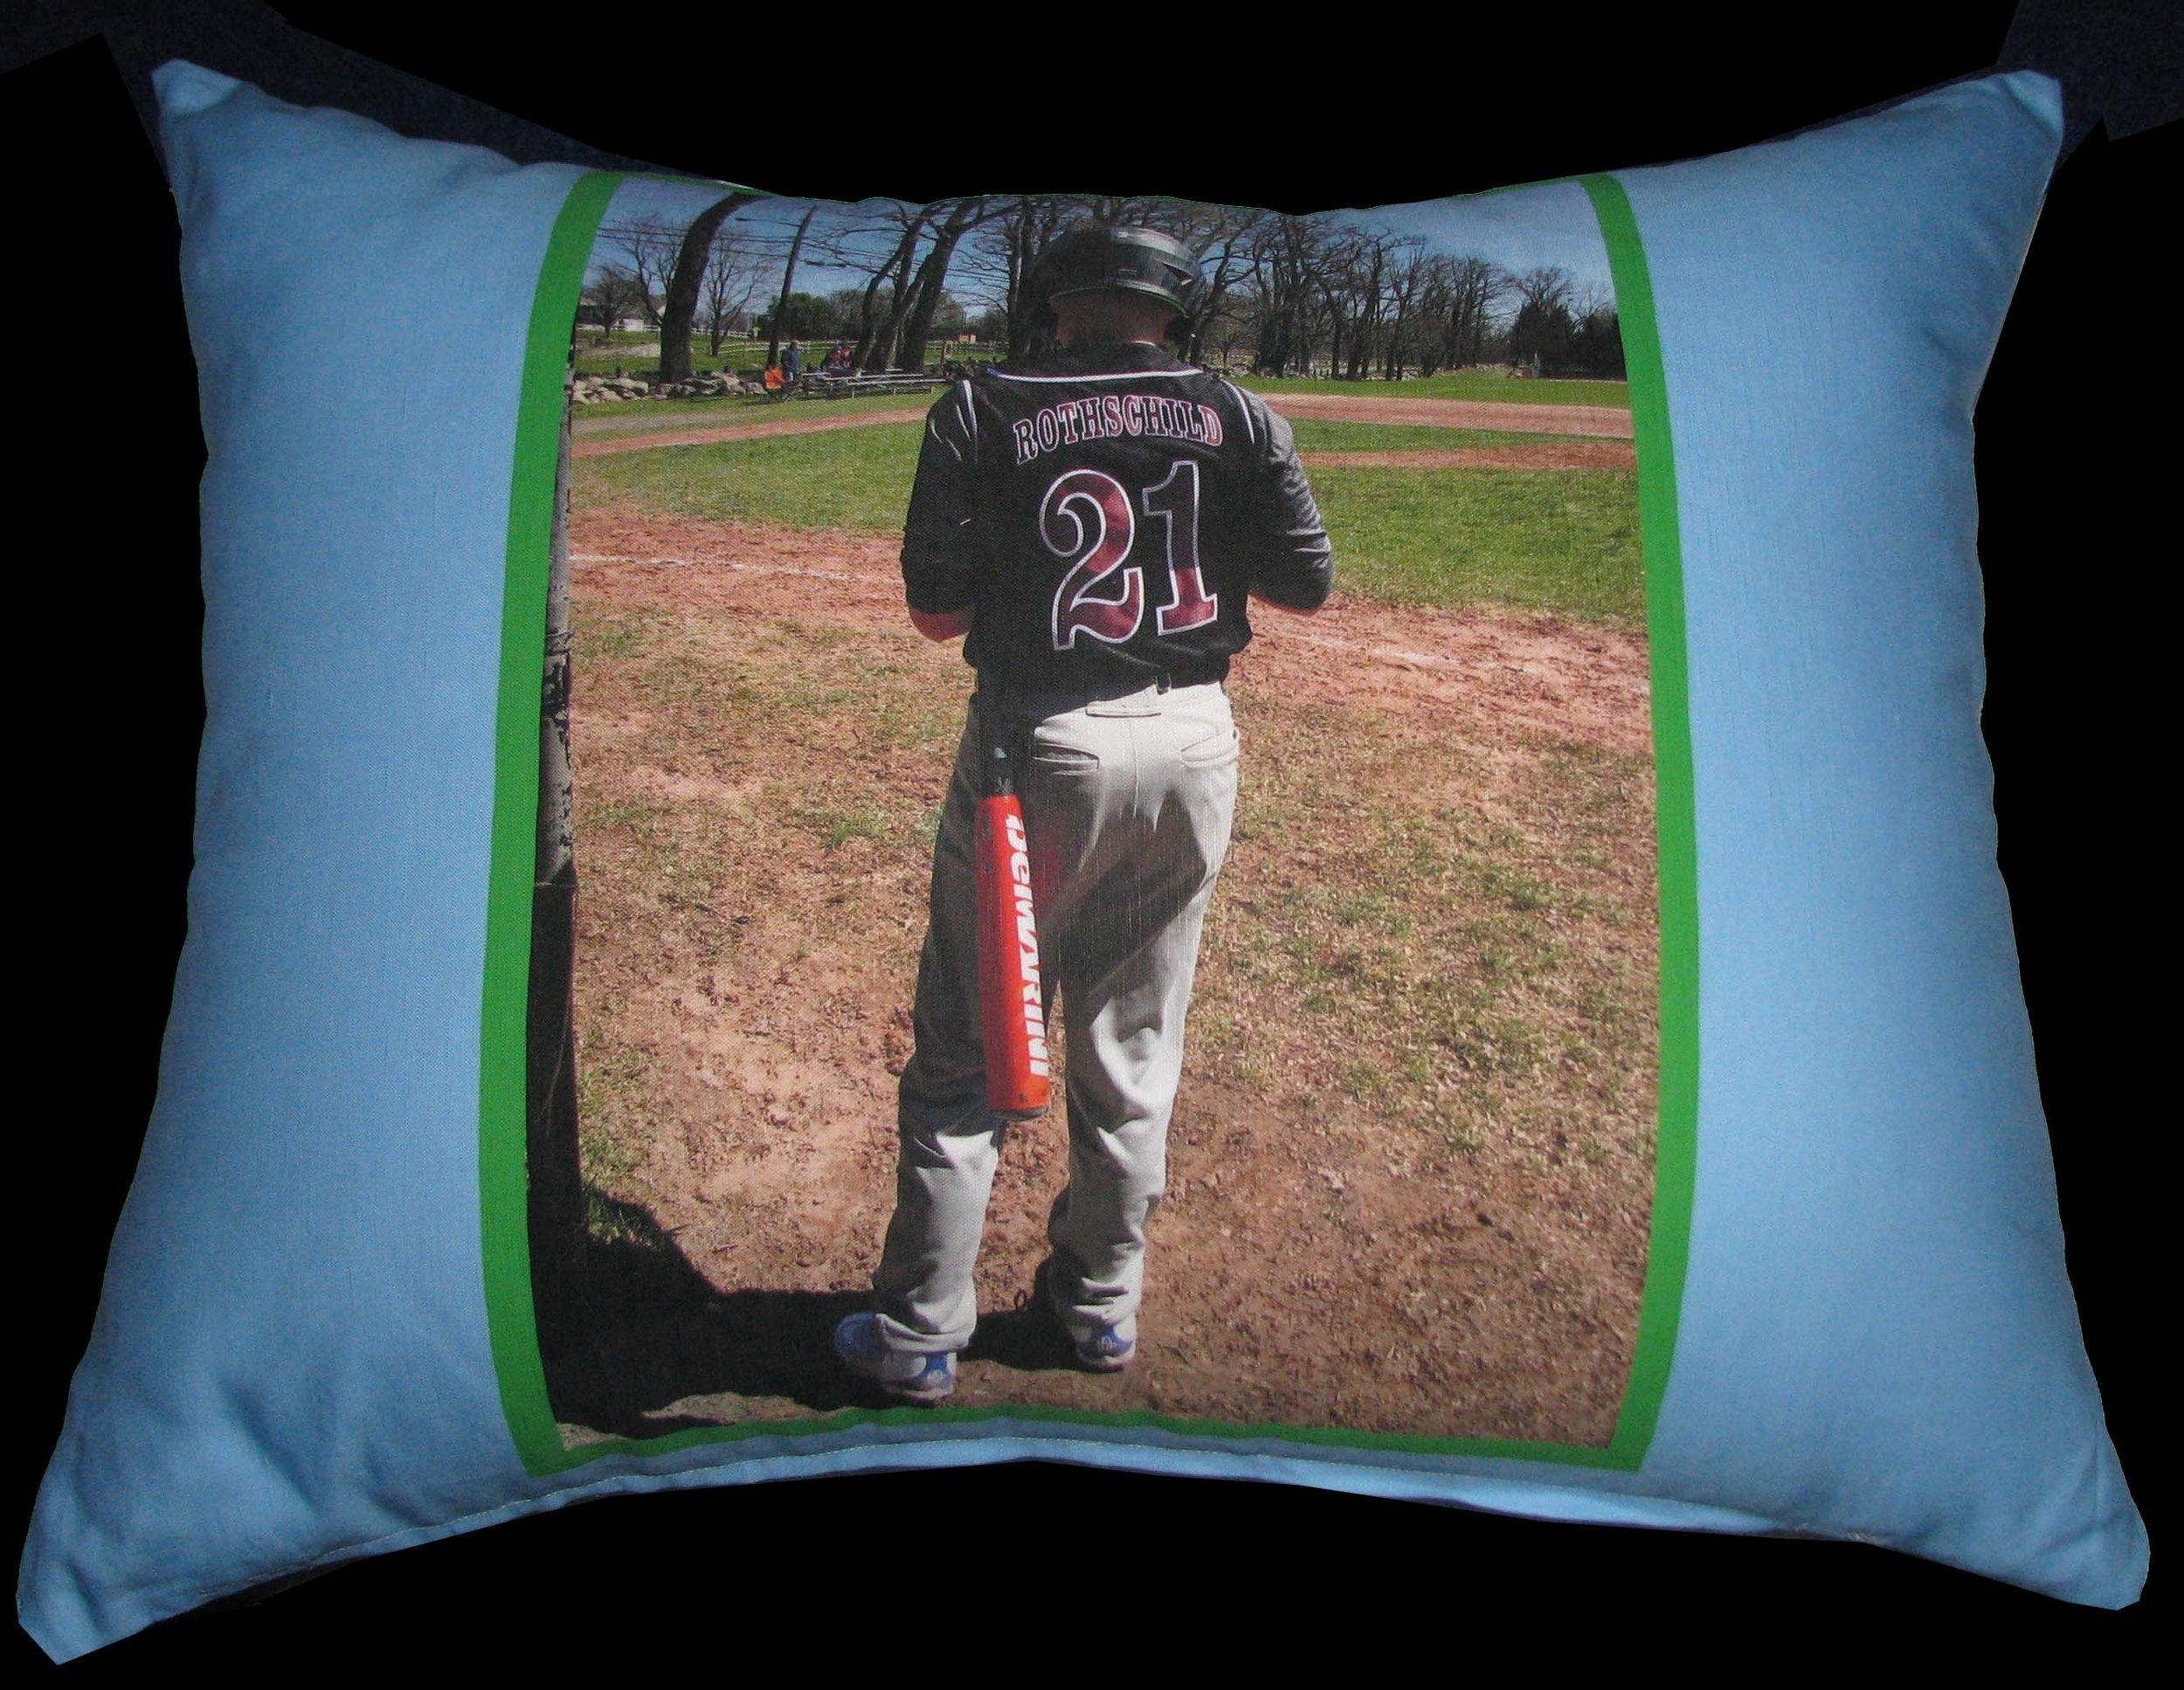 baseball_player_IMG_7925baseballfrontFW.jpg